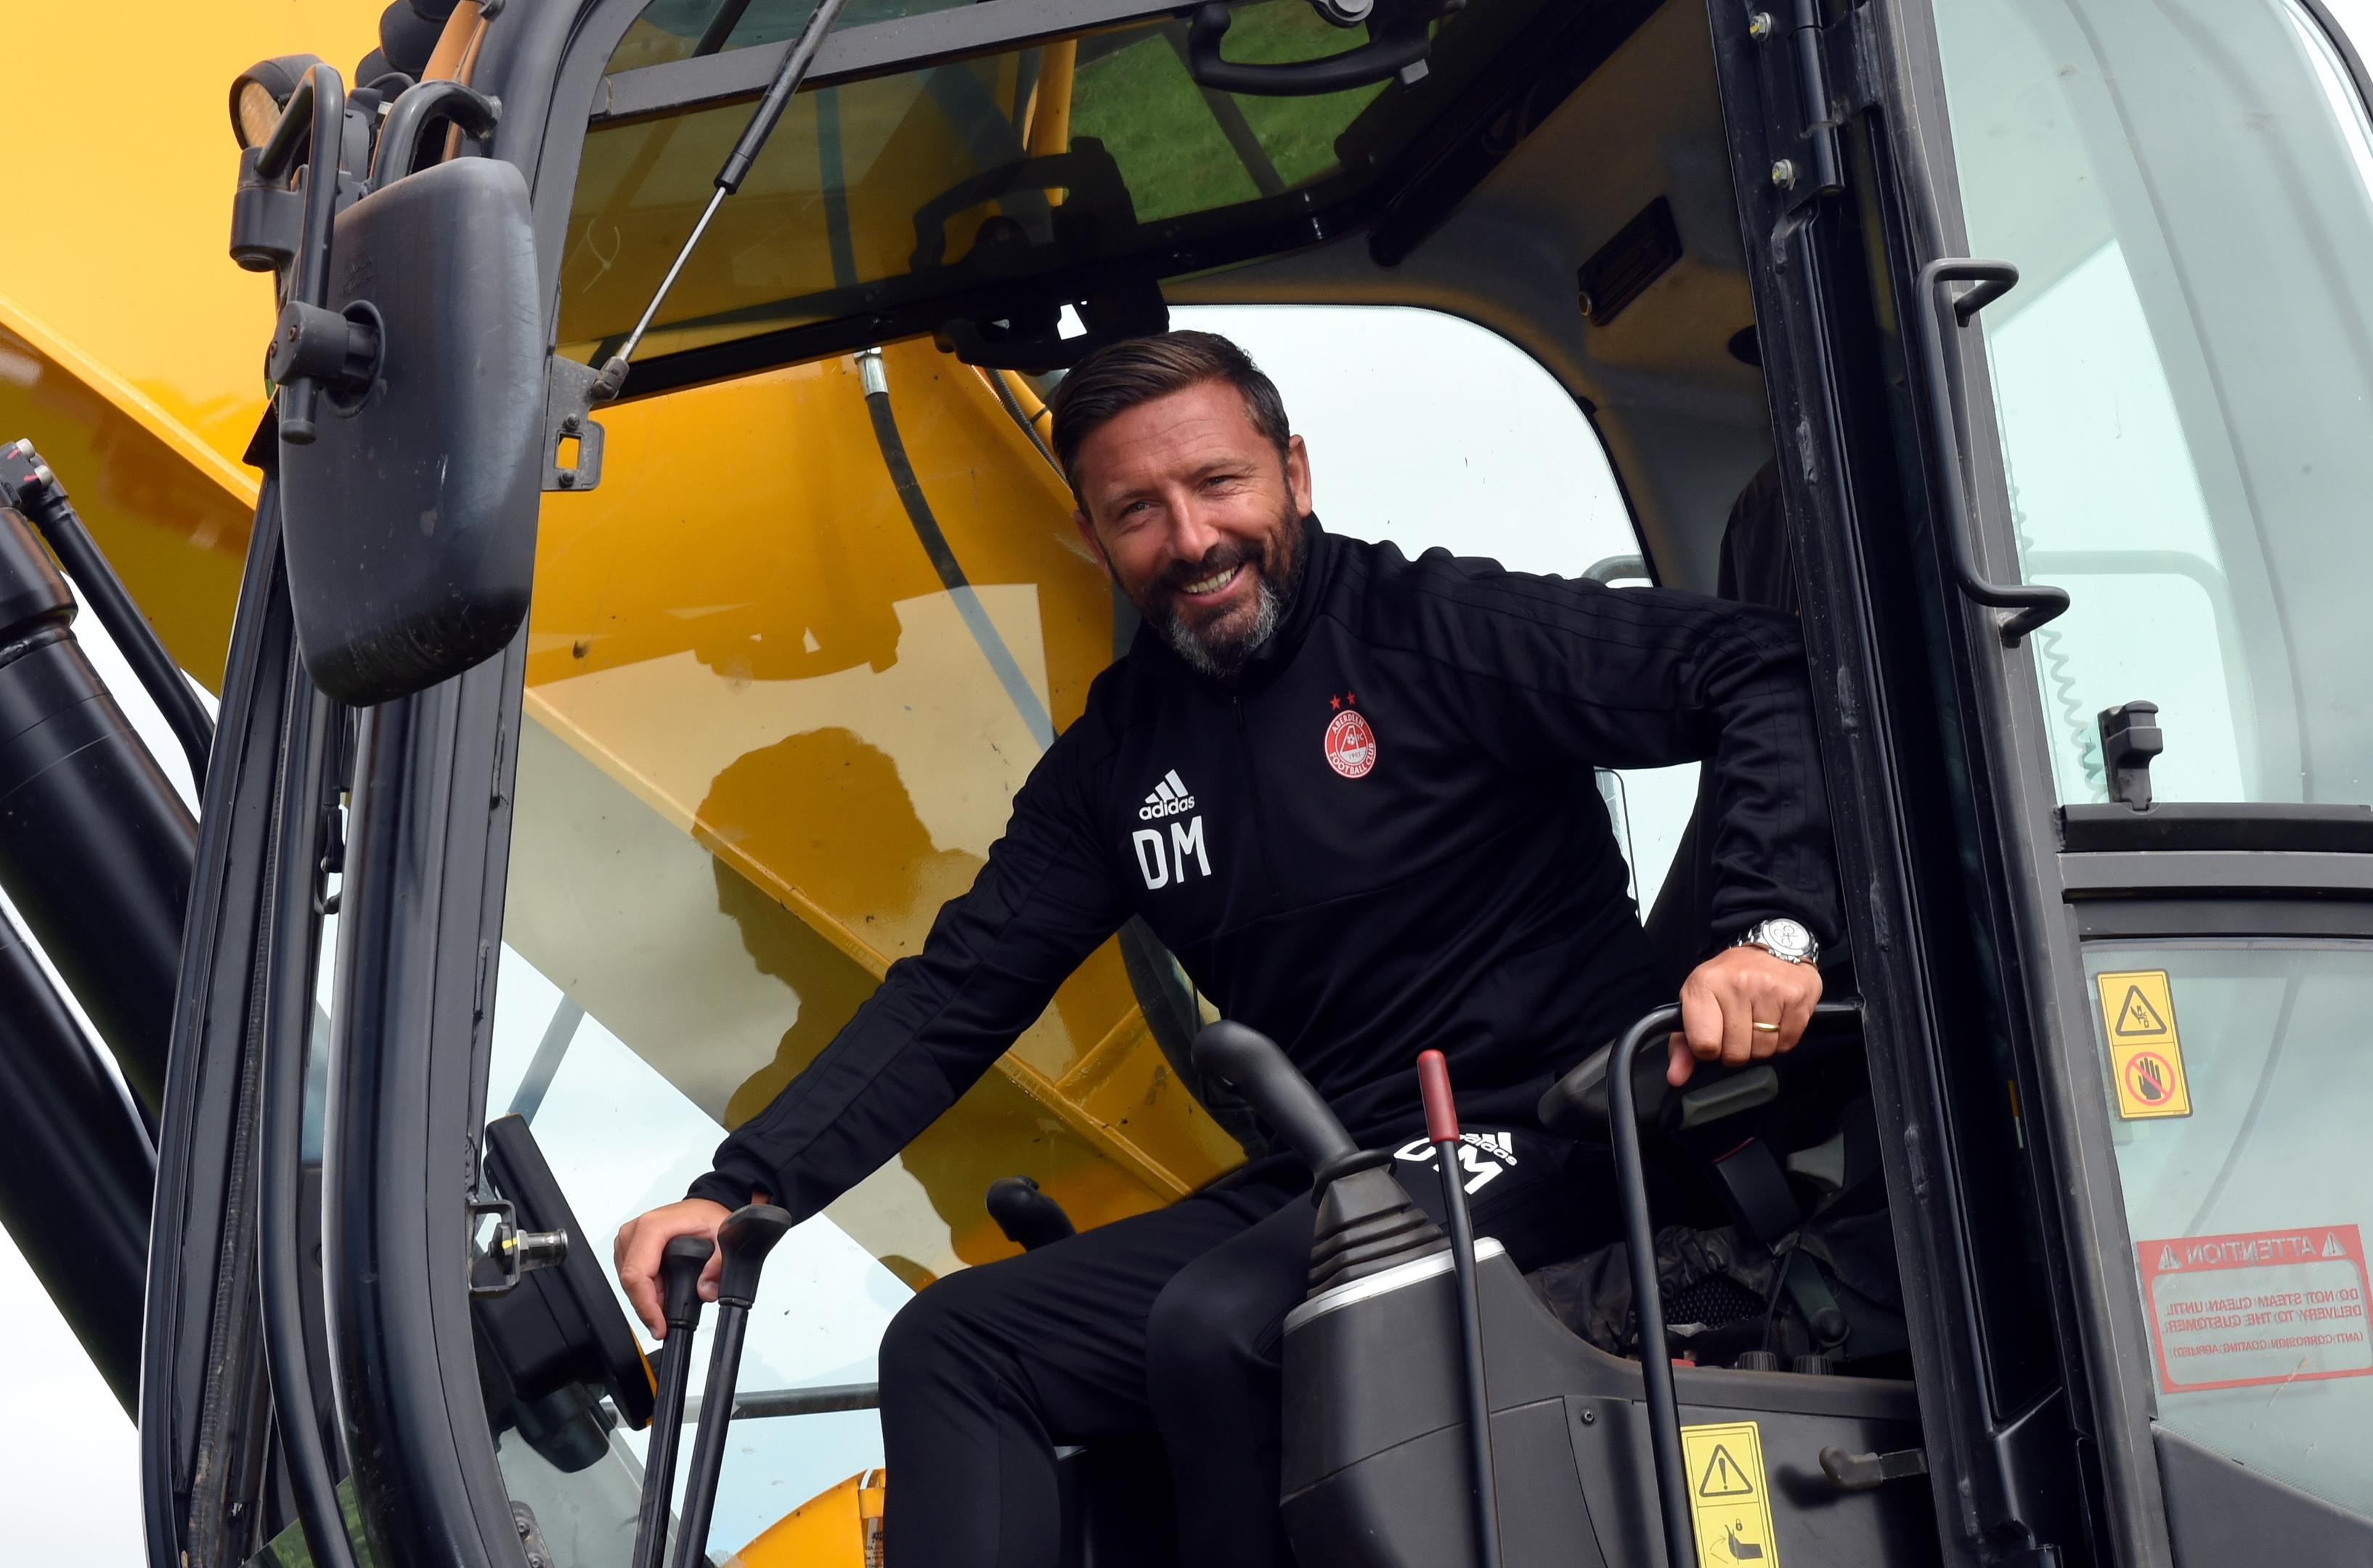 Pictured is AFC manager, Derek McInnes.